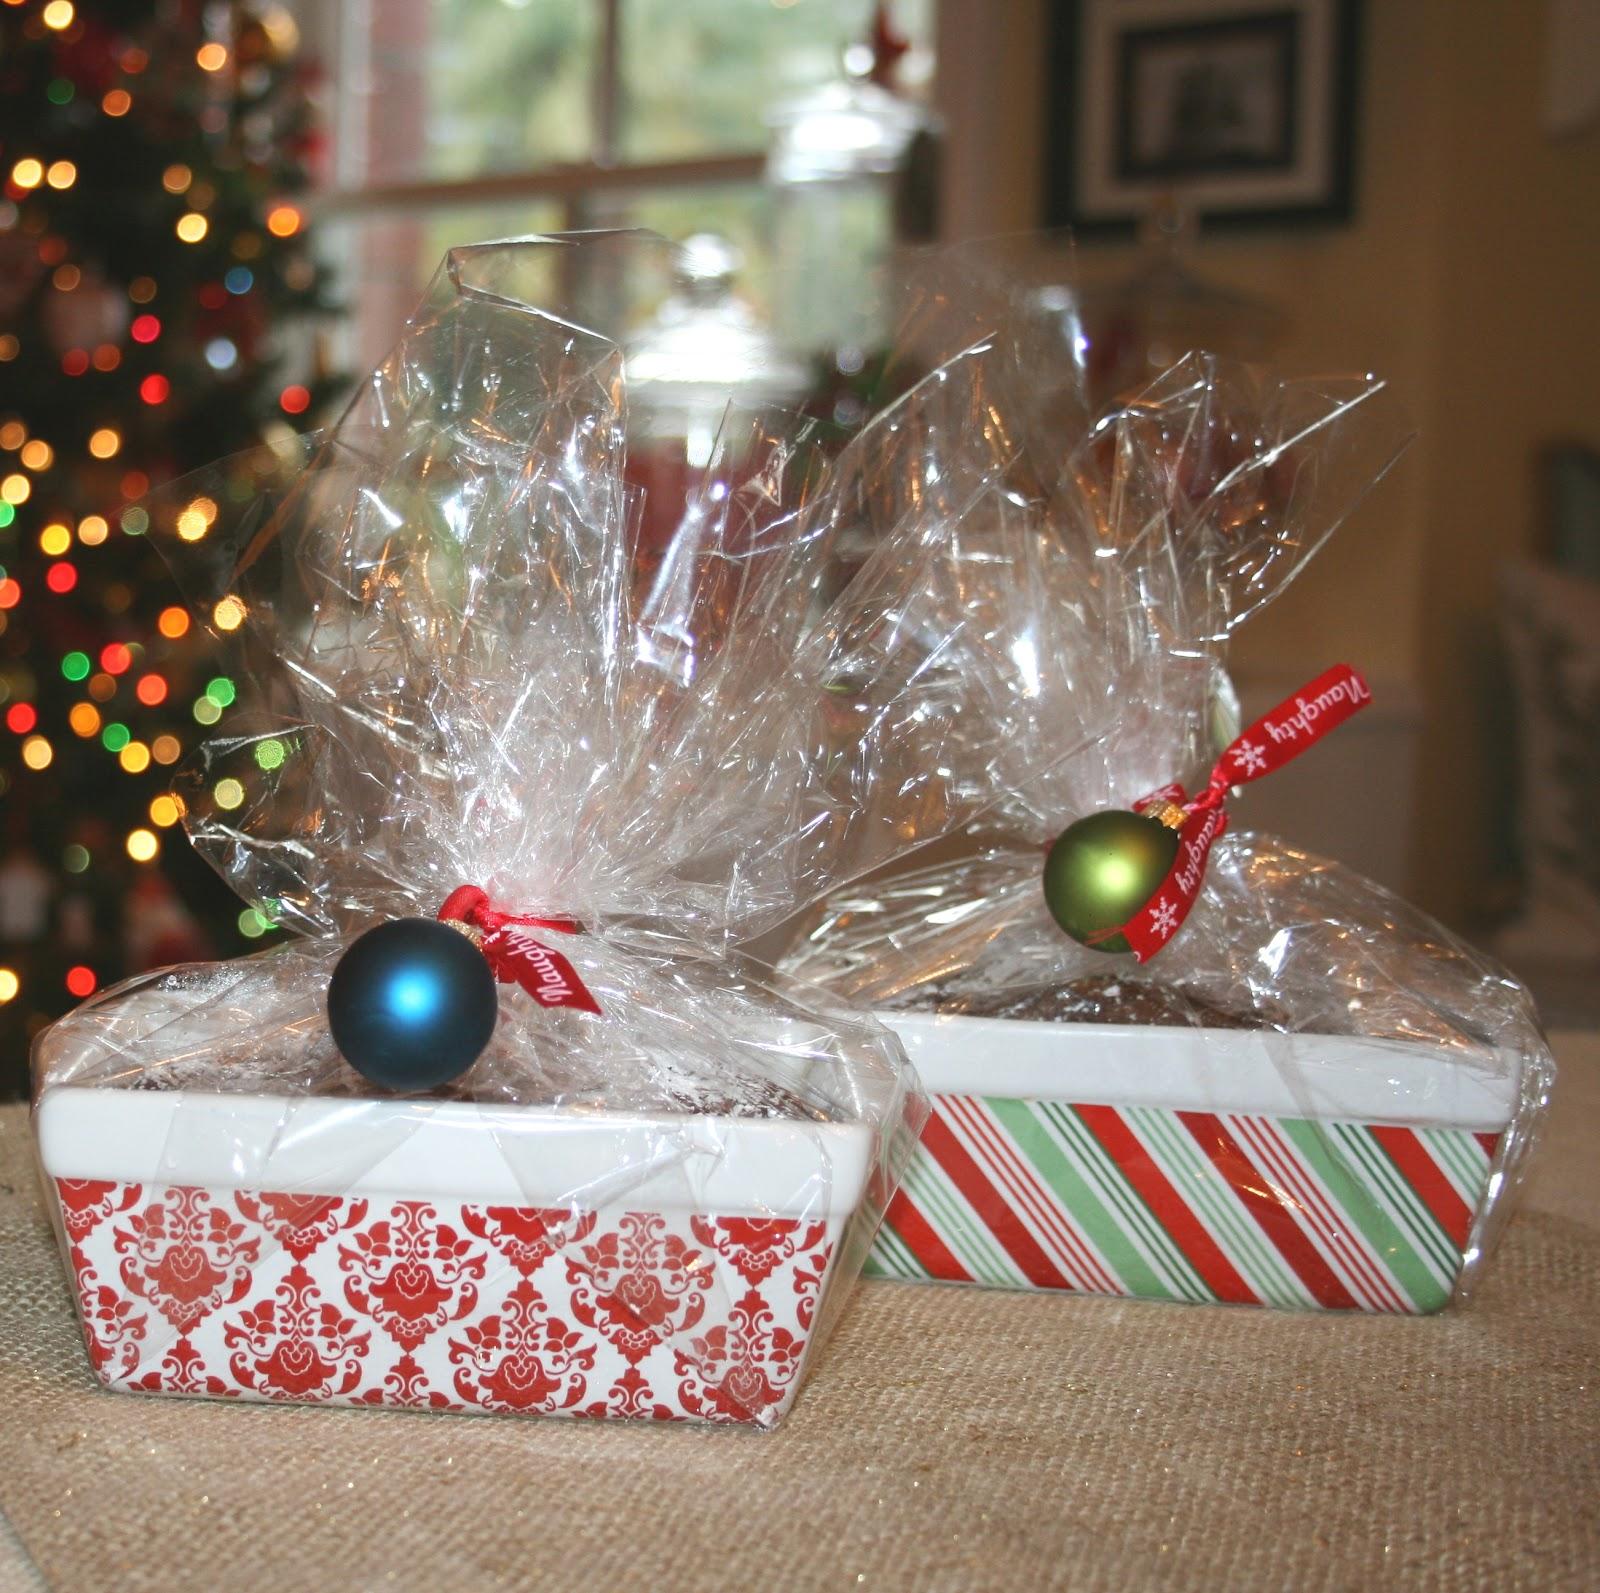 Ciao! Newport Beach: A Sweet Little Christmas Boutique